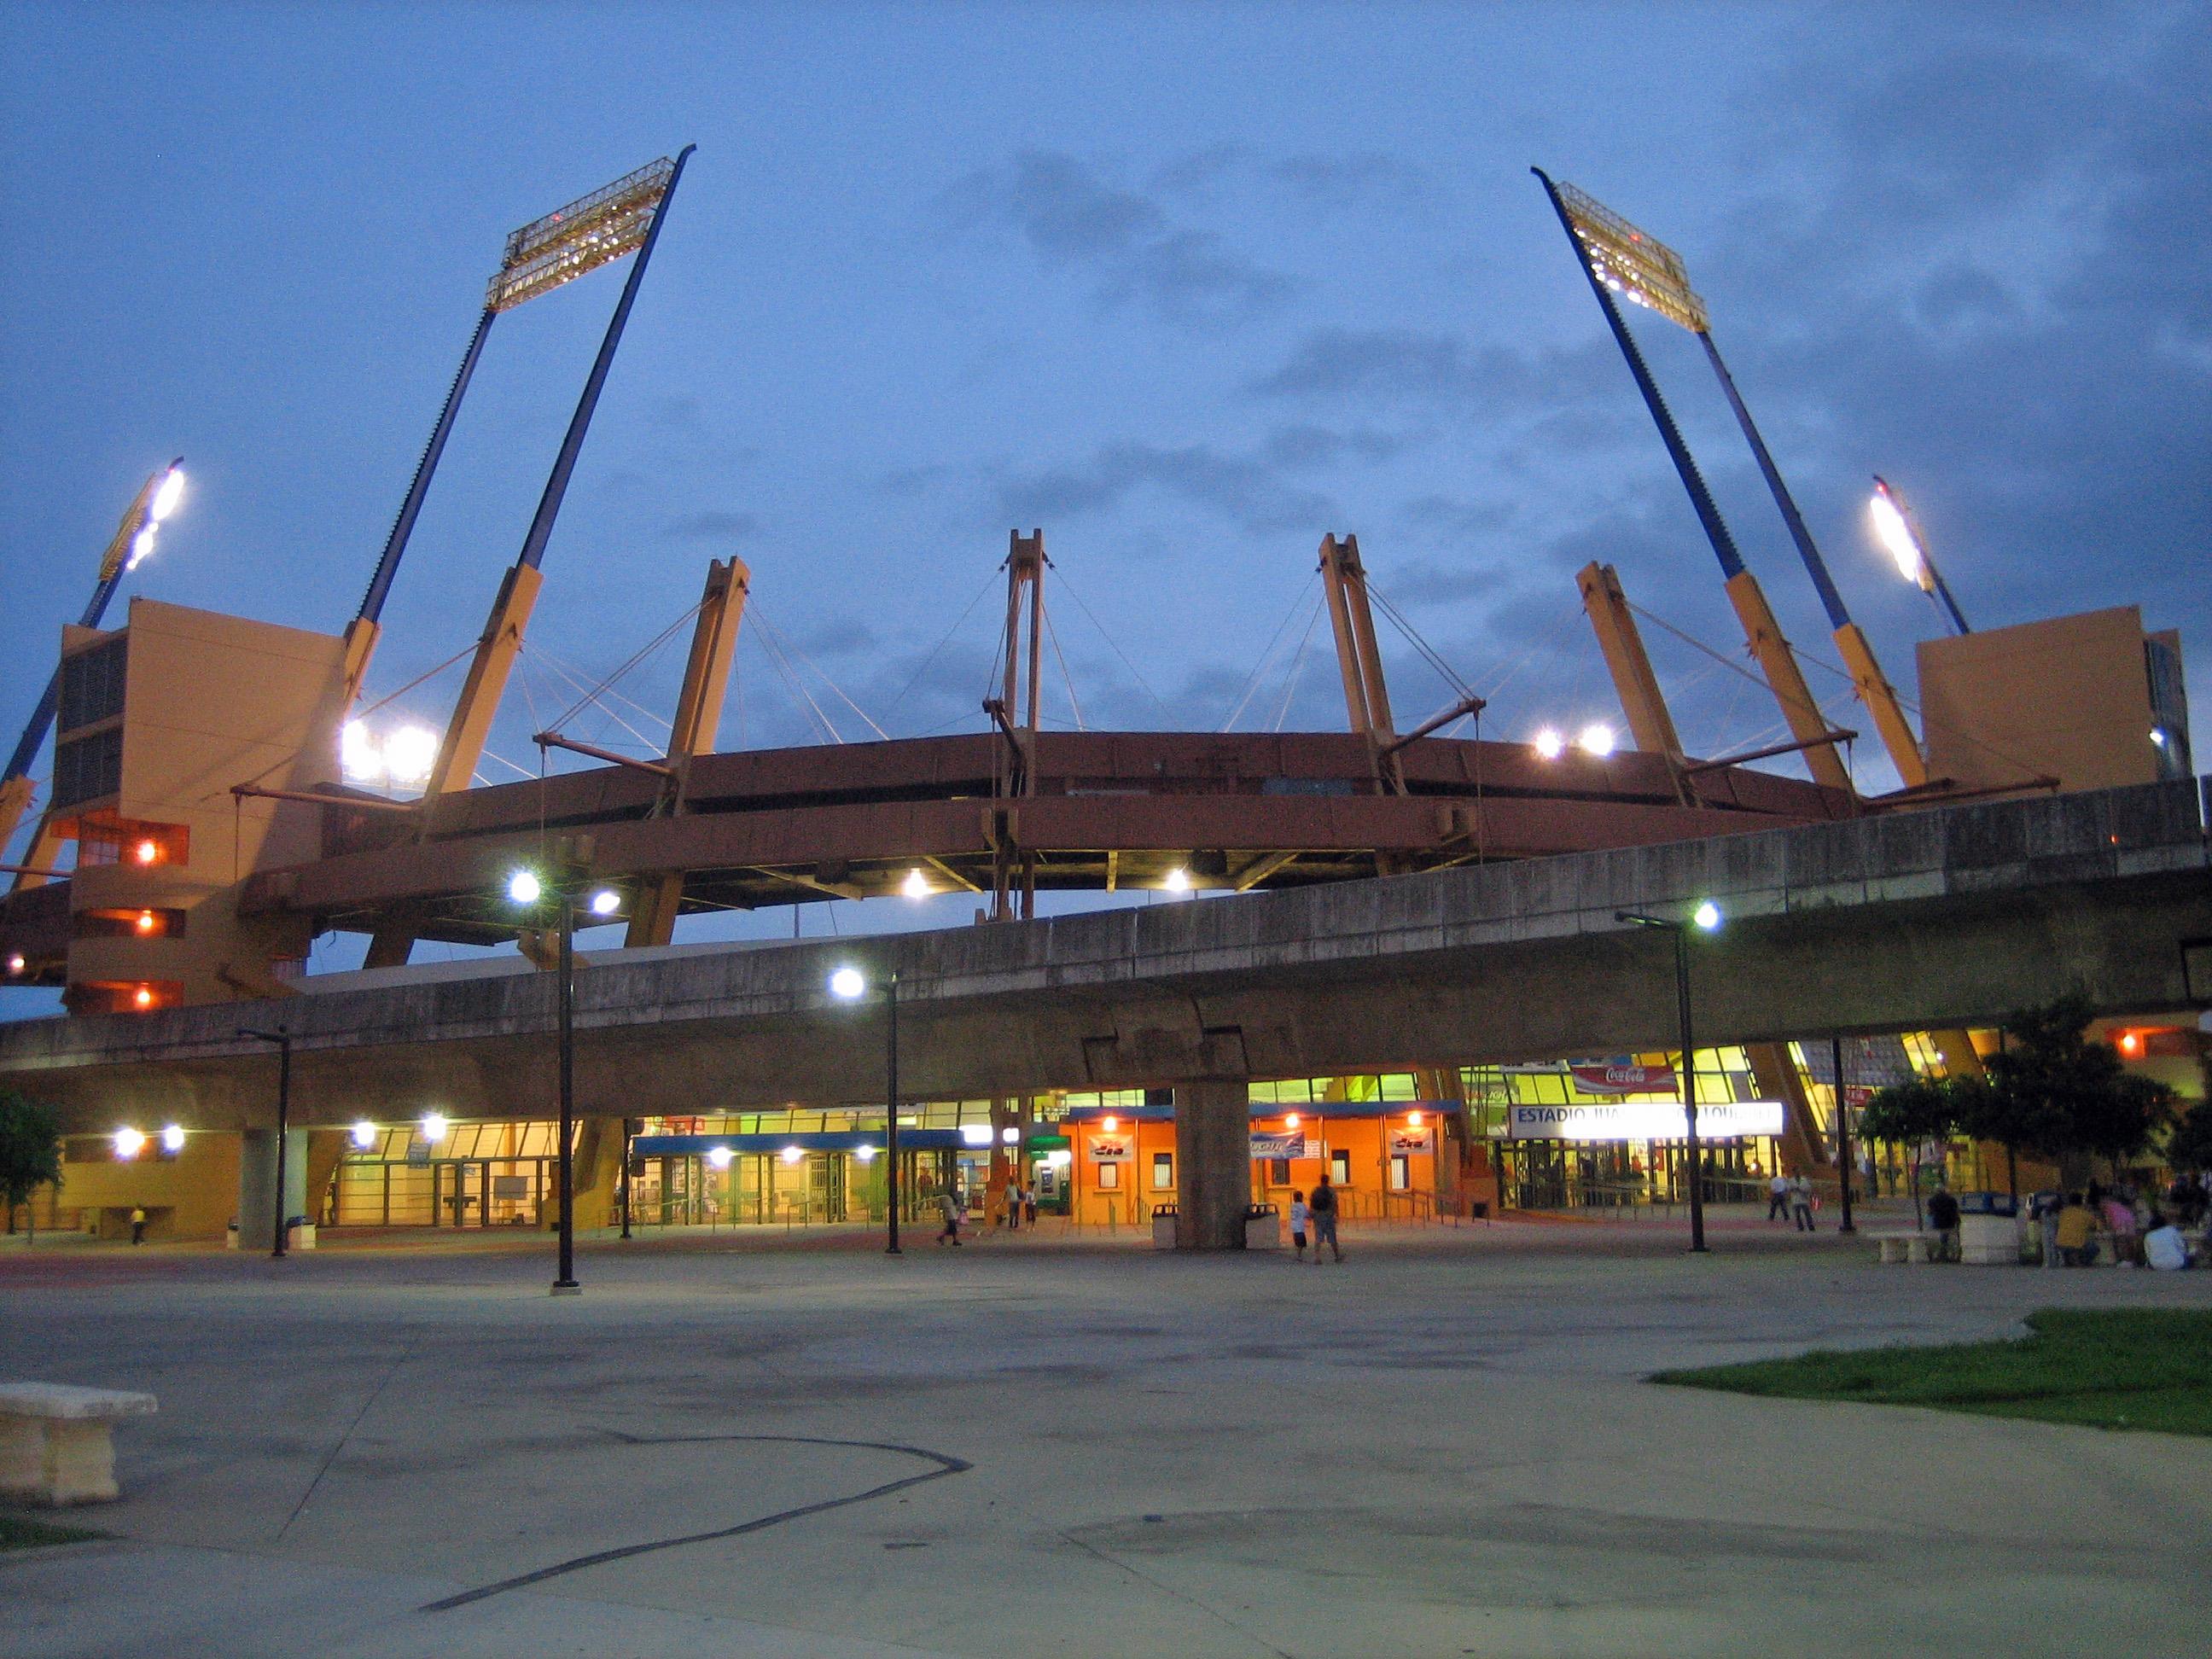 Estadio_Juan_Ram%C3%B3n_Loubriel_Noche.jpg